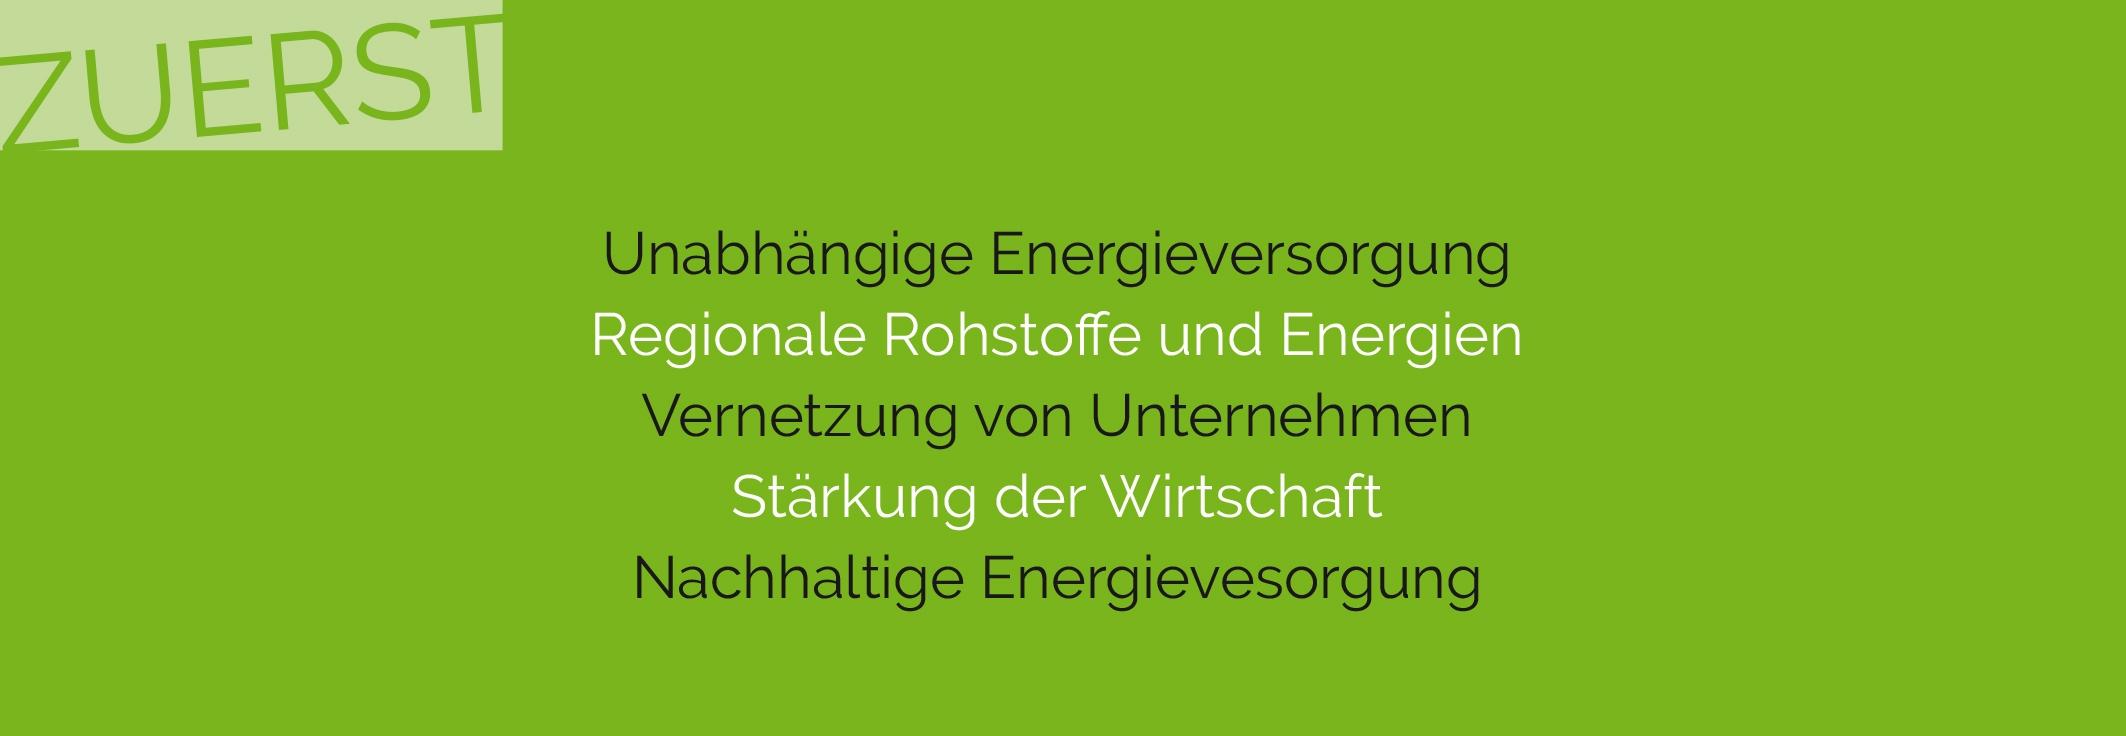 https://www.energie-erlebnisregion-huegelland.at/data/image/thumpnail/image.php?image=225/zuerst_at_article_4255_1.jpg